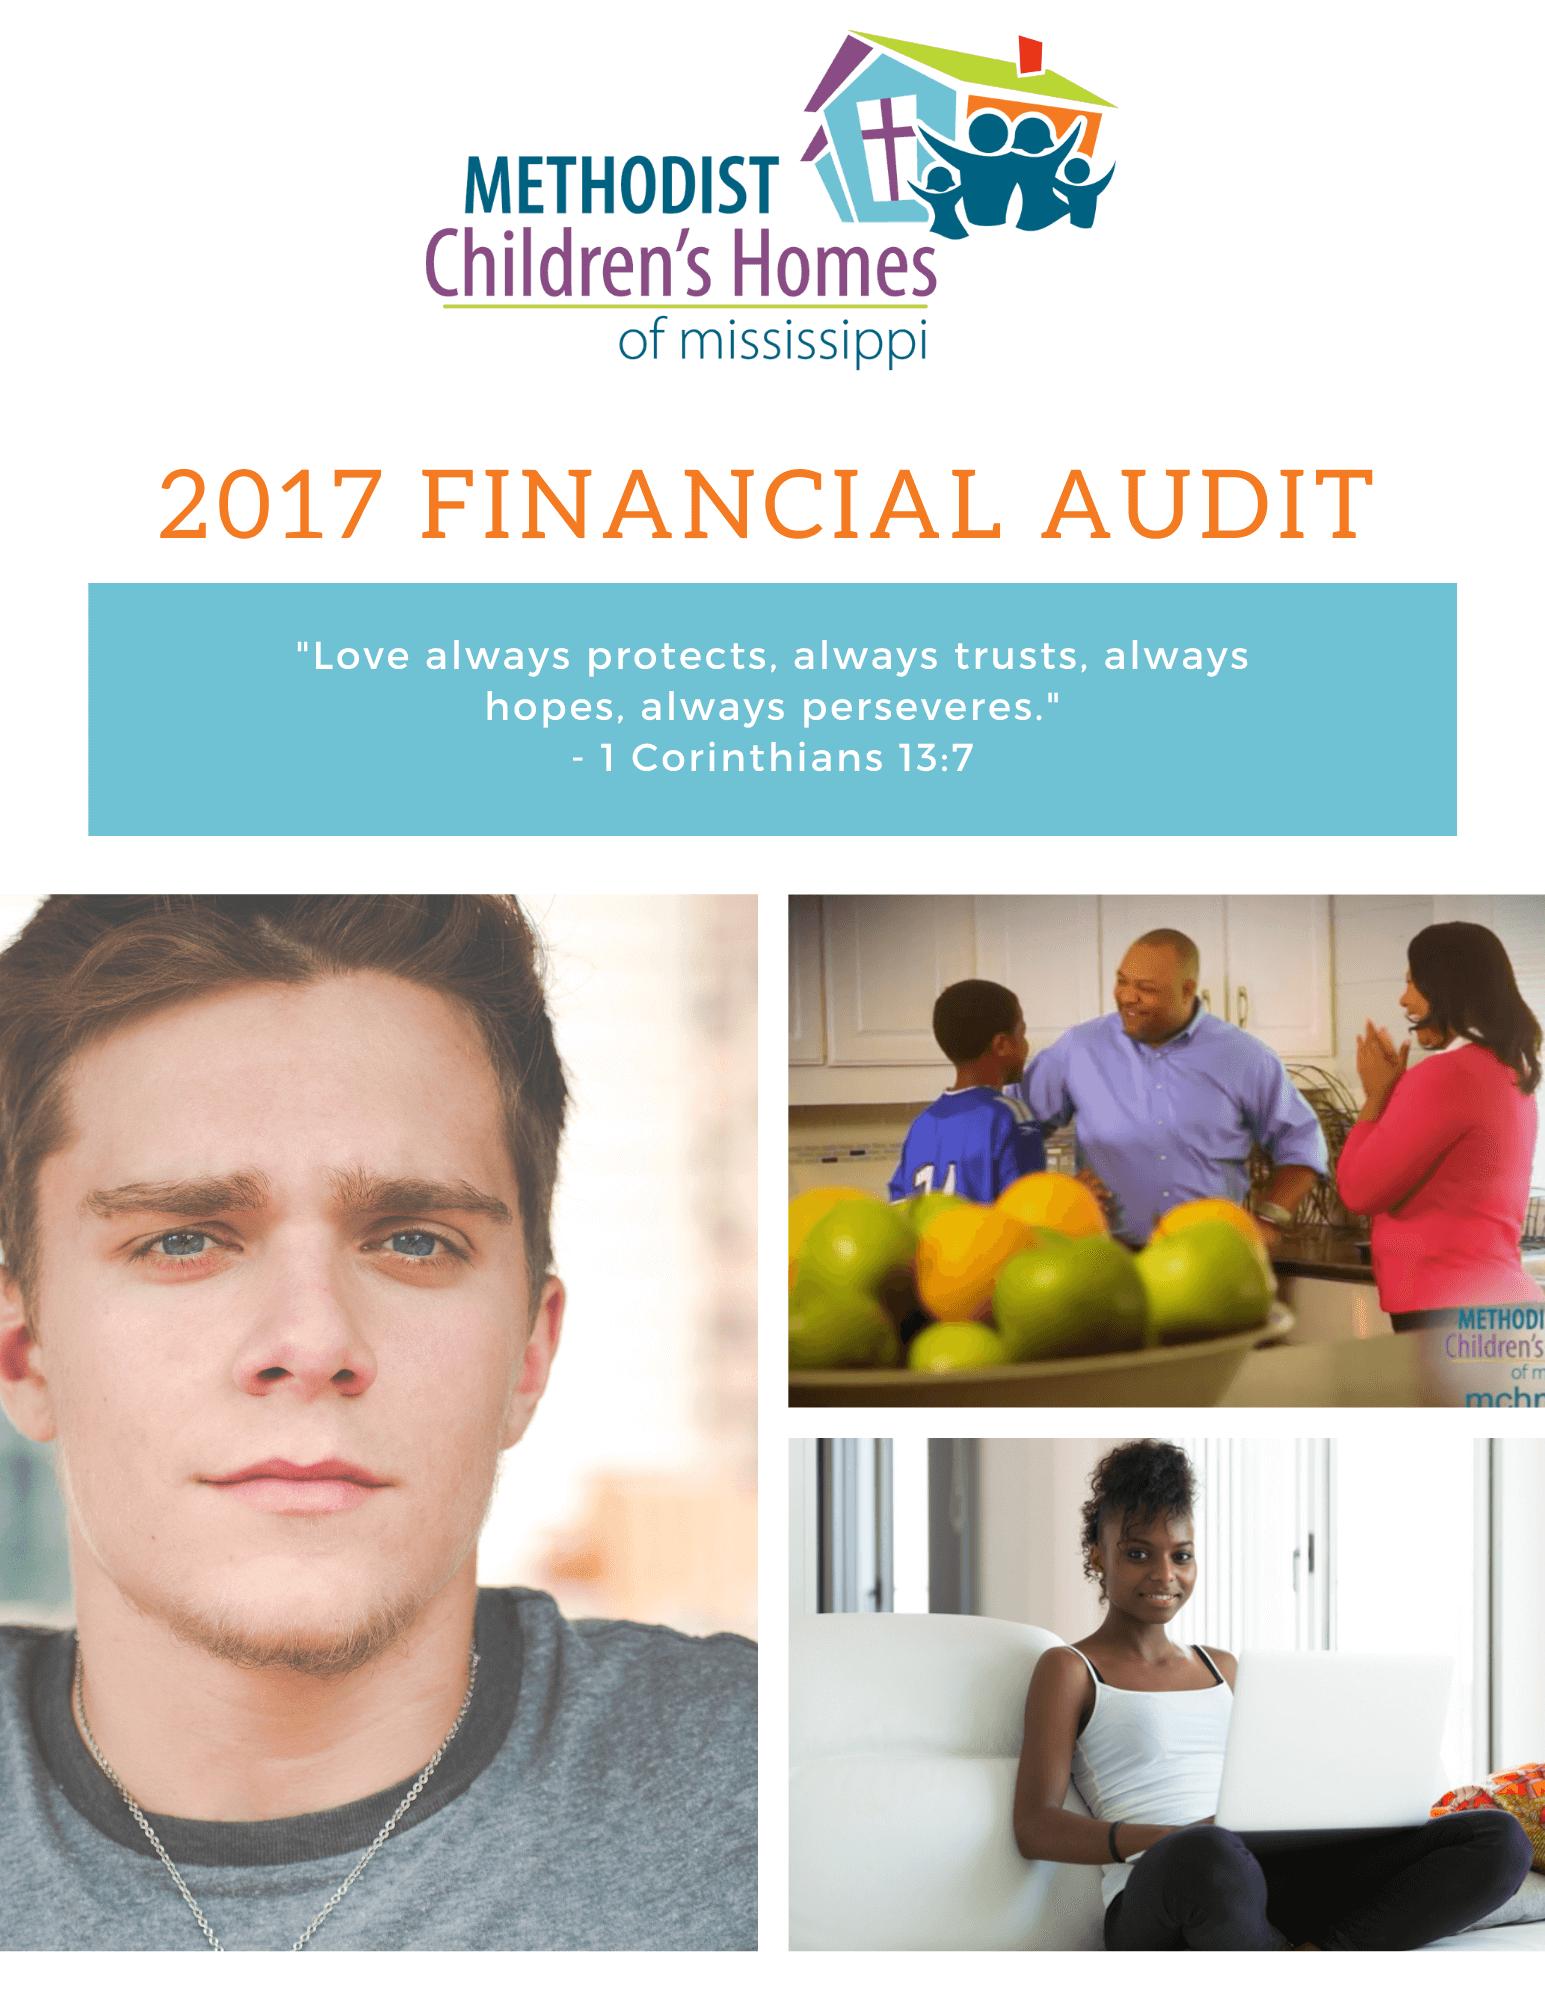 990 financial audit images (1)